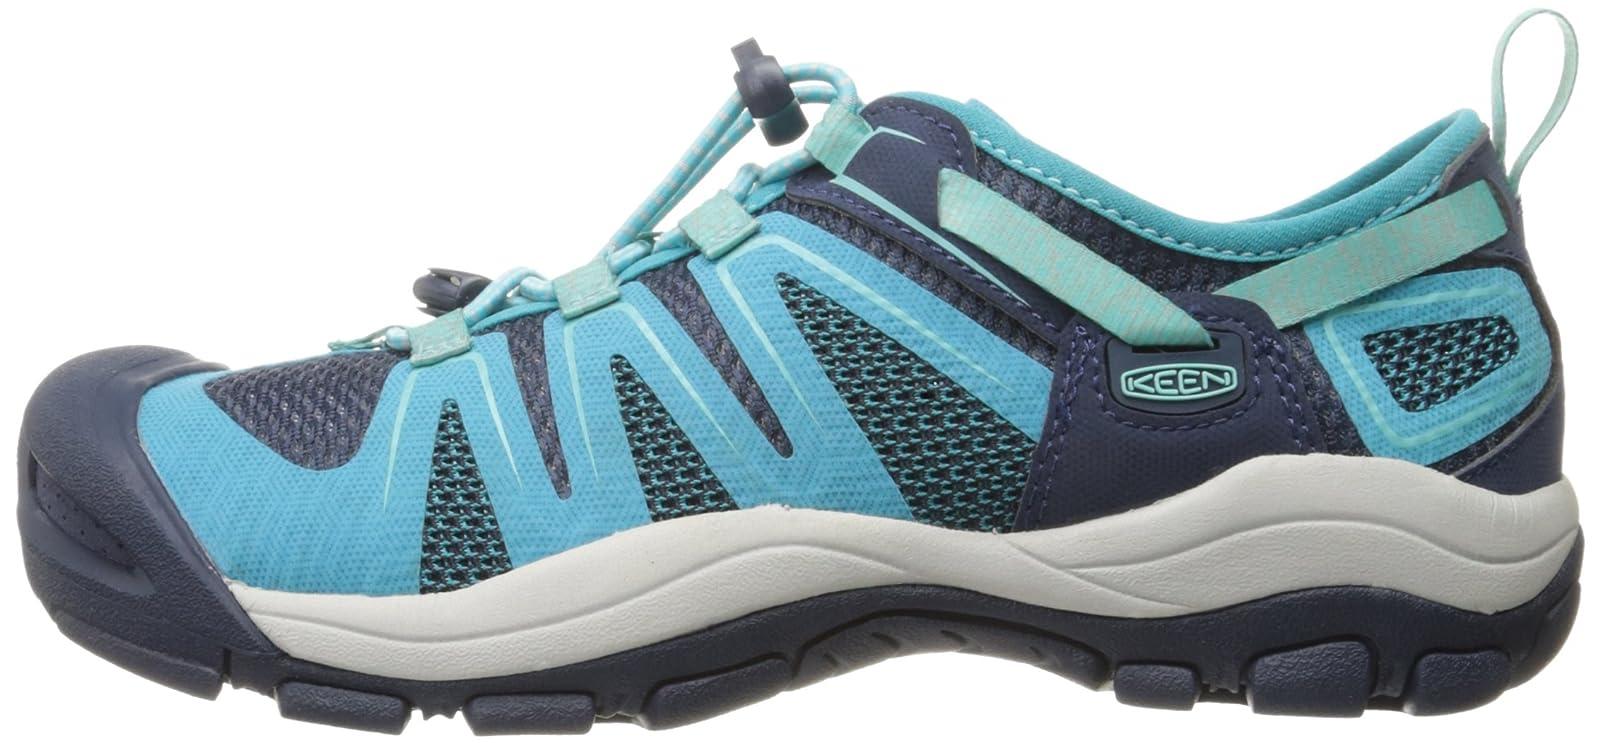 KEEN Women's Mckenzie II Hiking Shoe US - 5